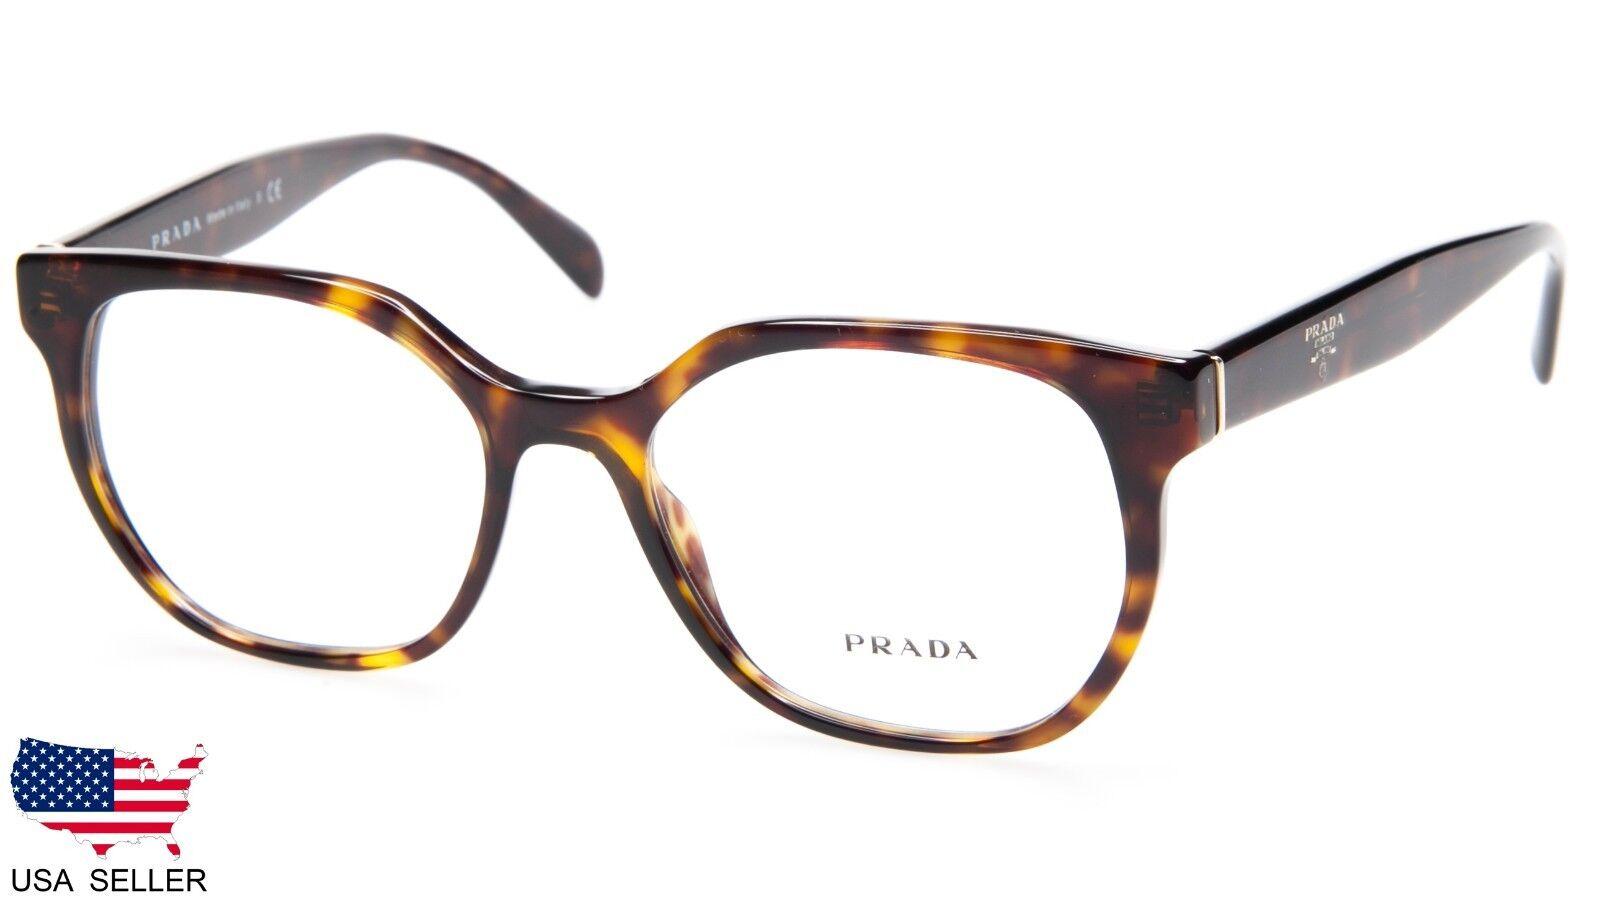 05af27987086 PRADA VPR 02u 2au-1o1 Havana Eyeglasses Glasses Frame 52-17-140 ...